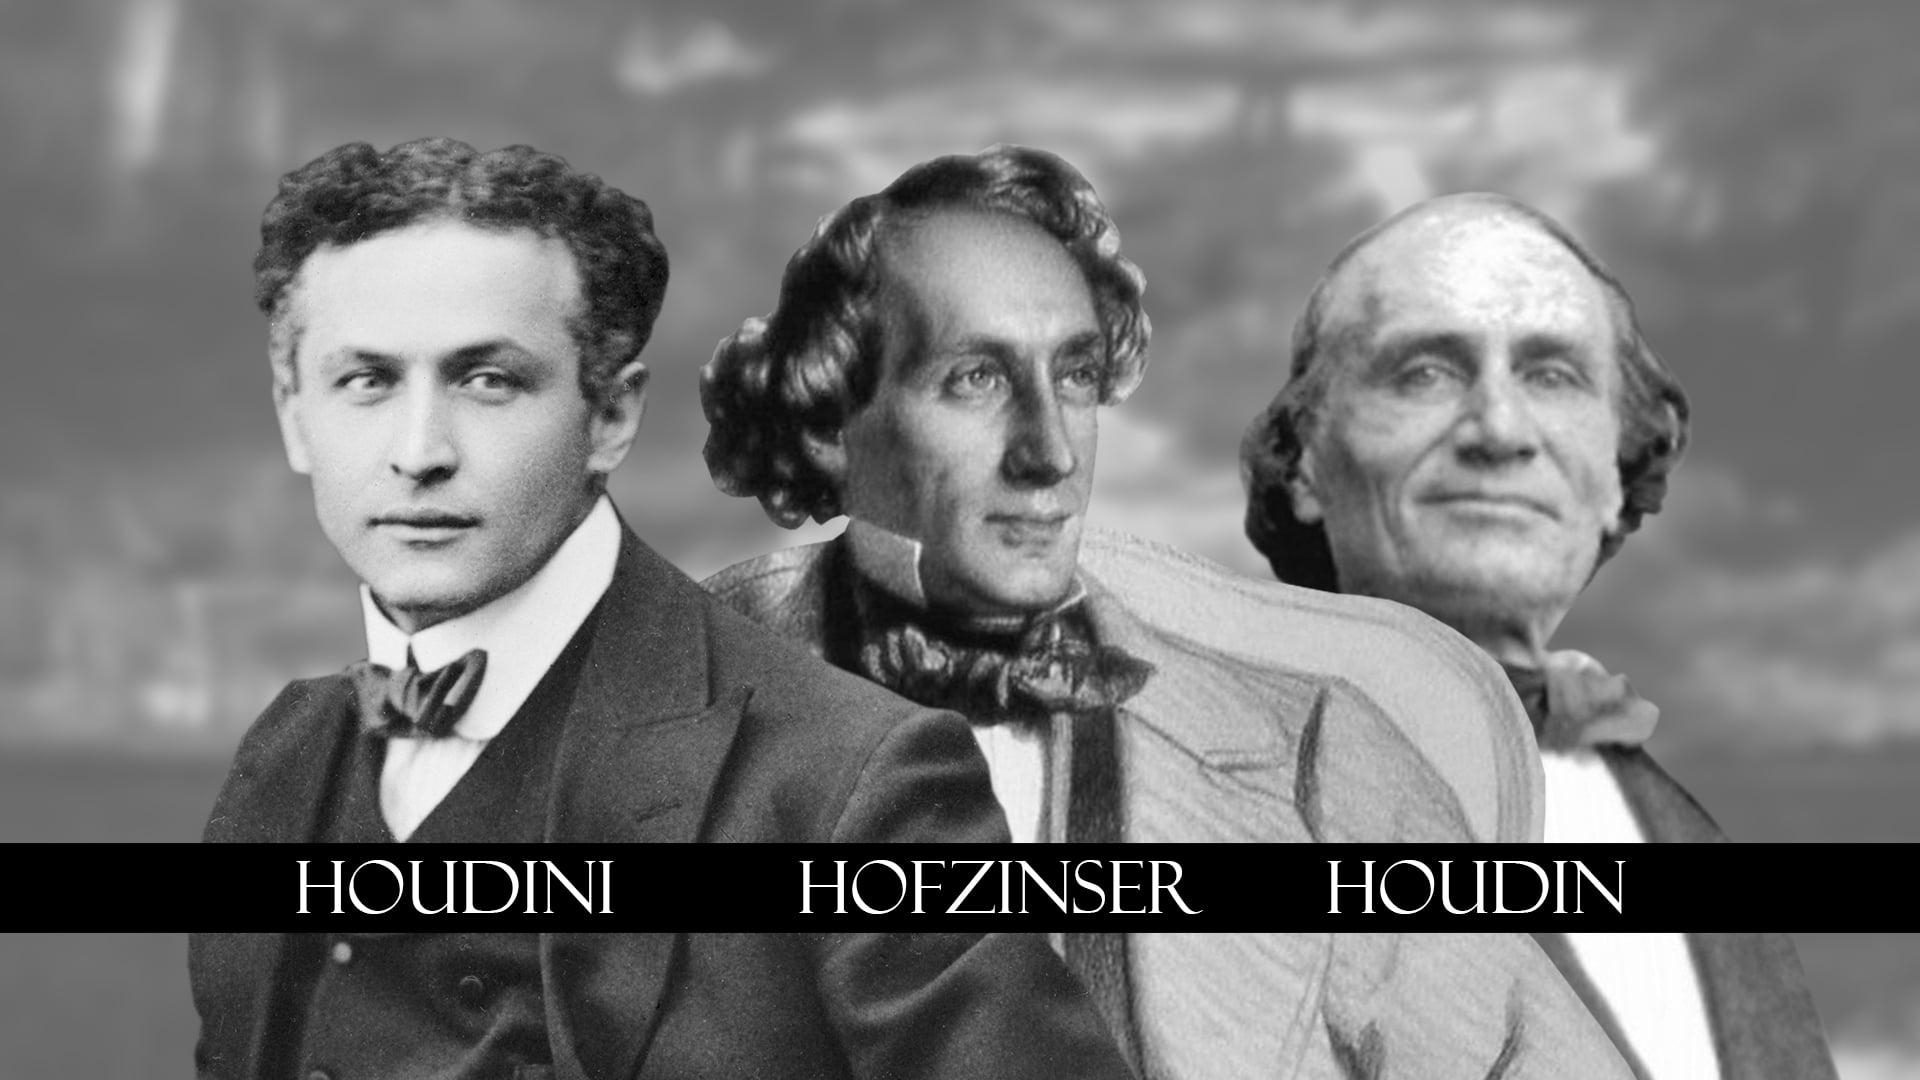 Houdini, Hofzinser, Houdin